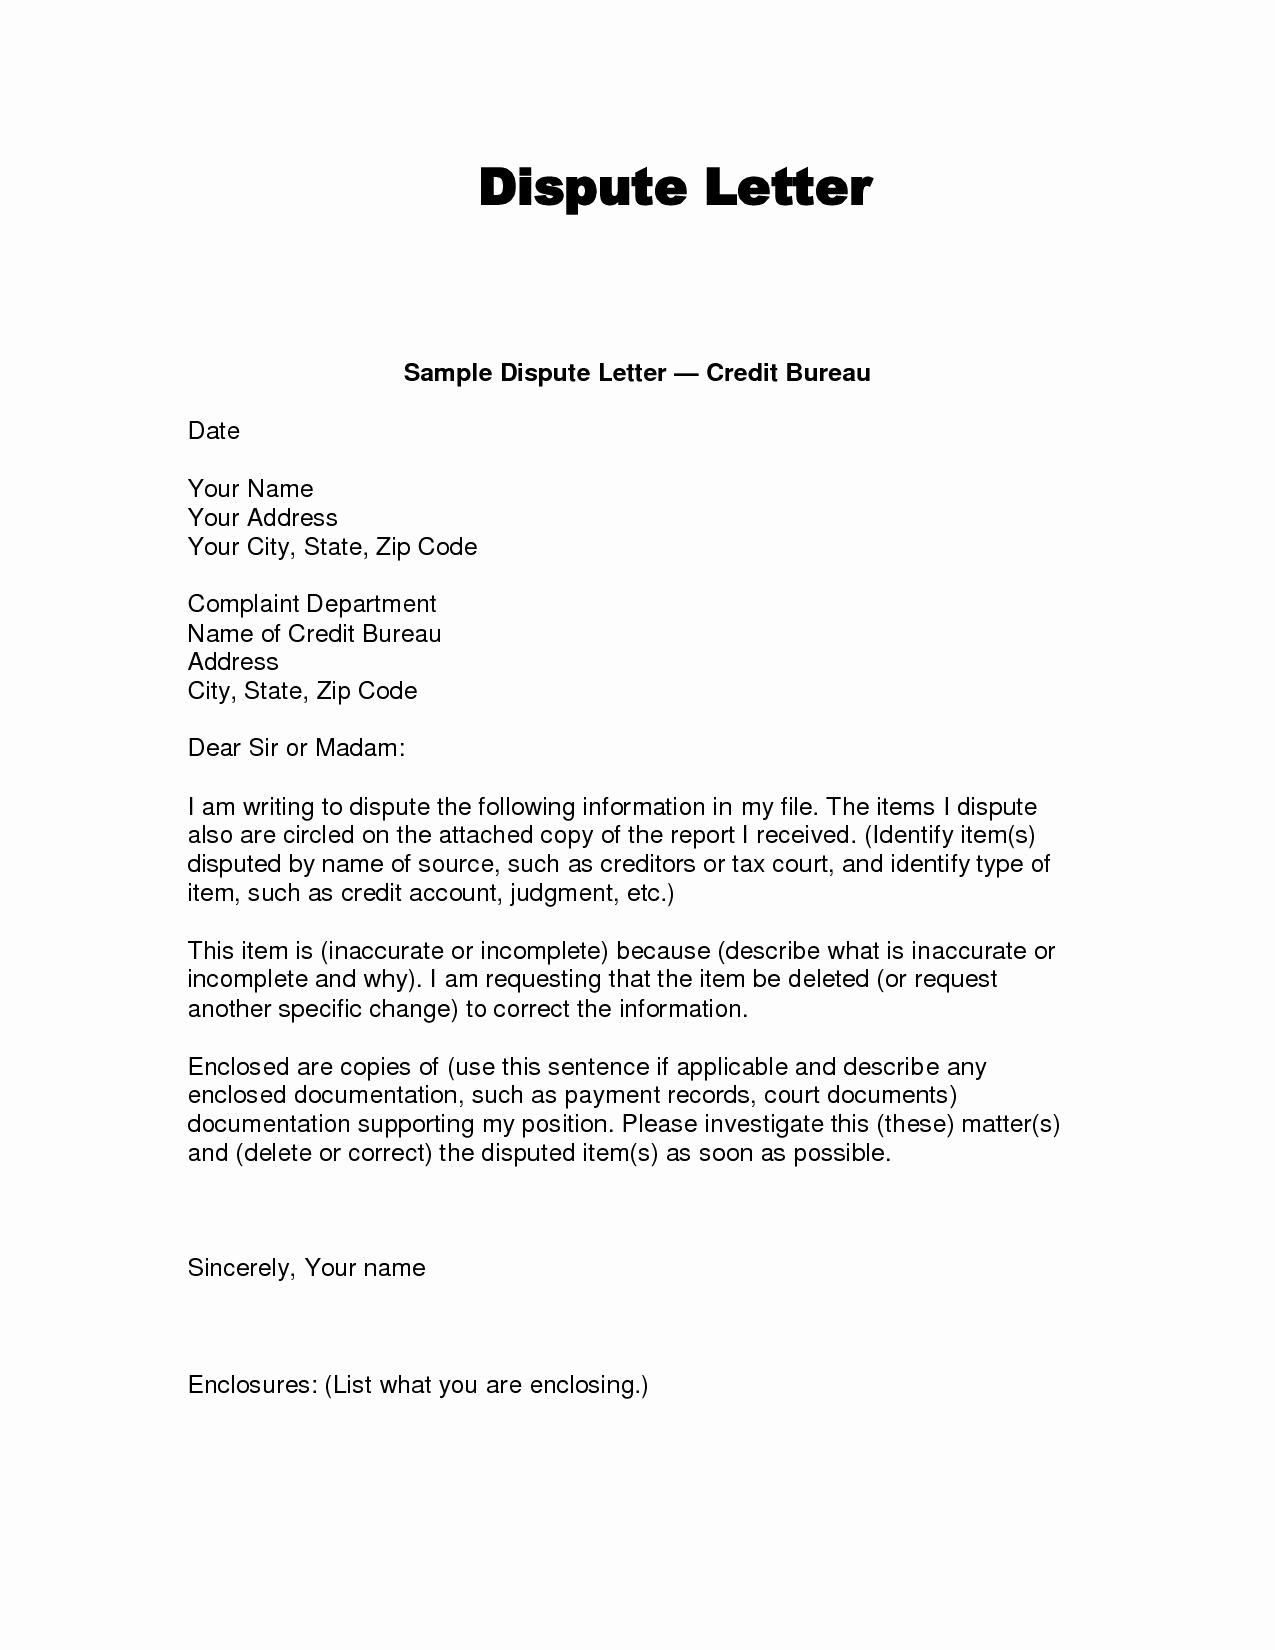 Credit Card Dispute Letter Template Unique Writing Dispute Letter format